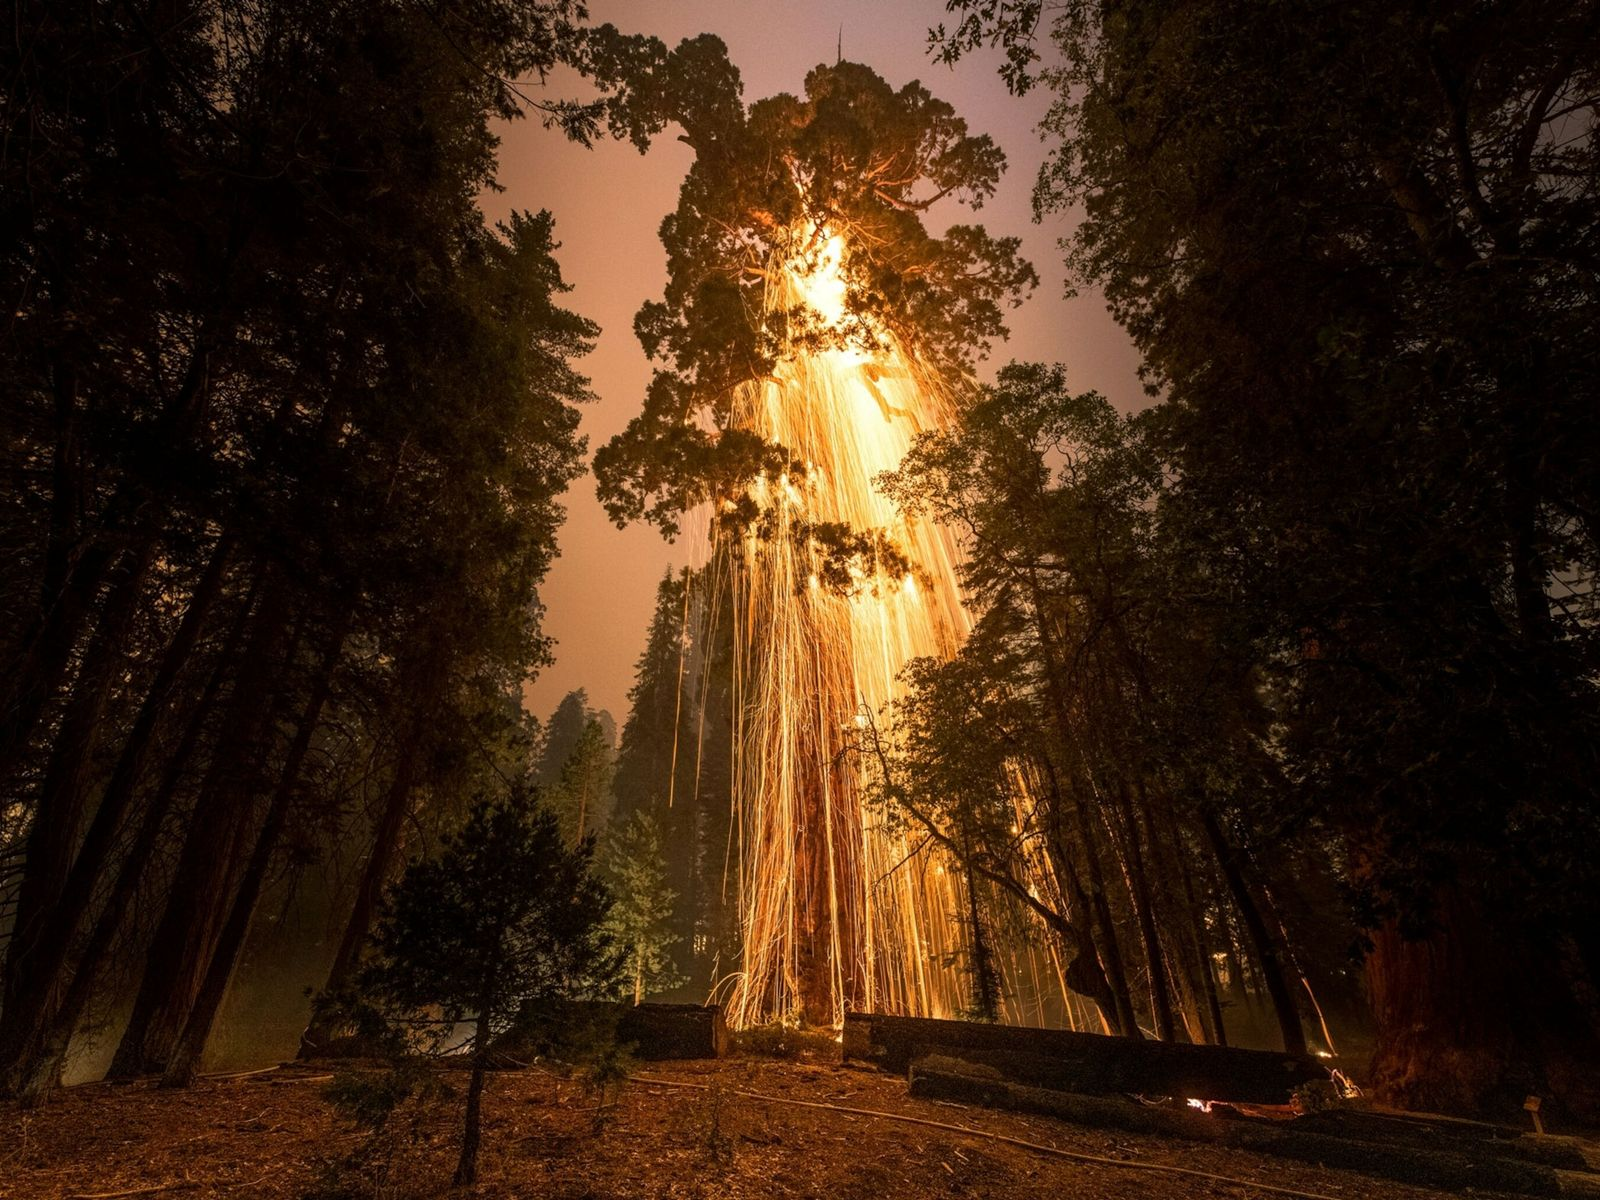 A giant sequoia burns